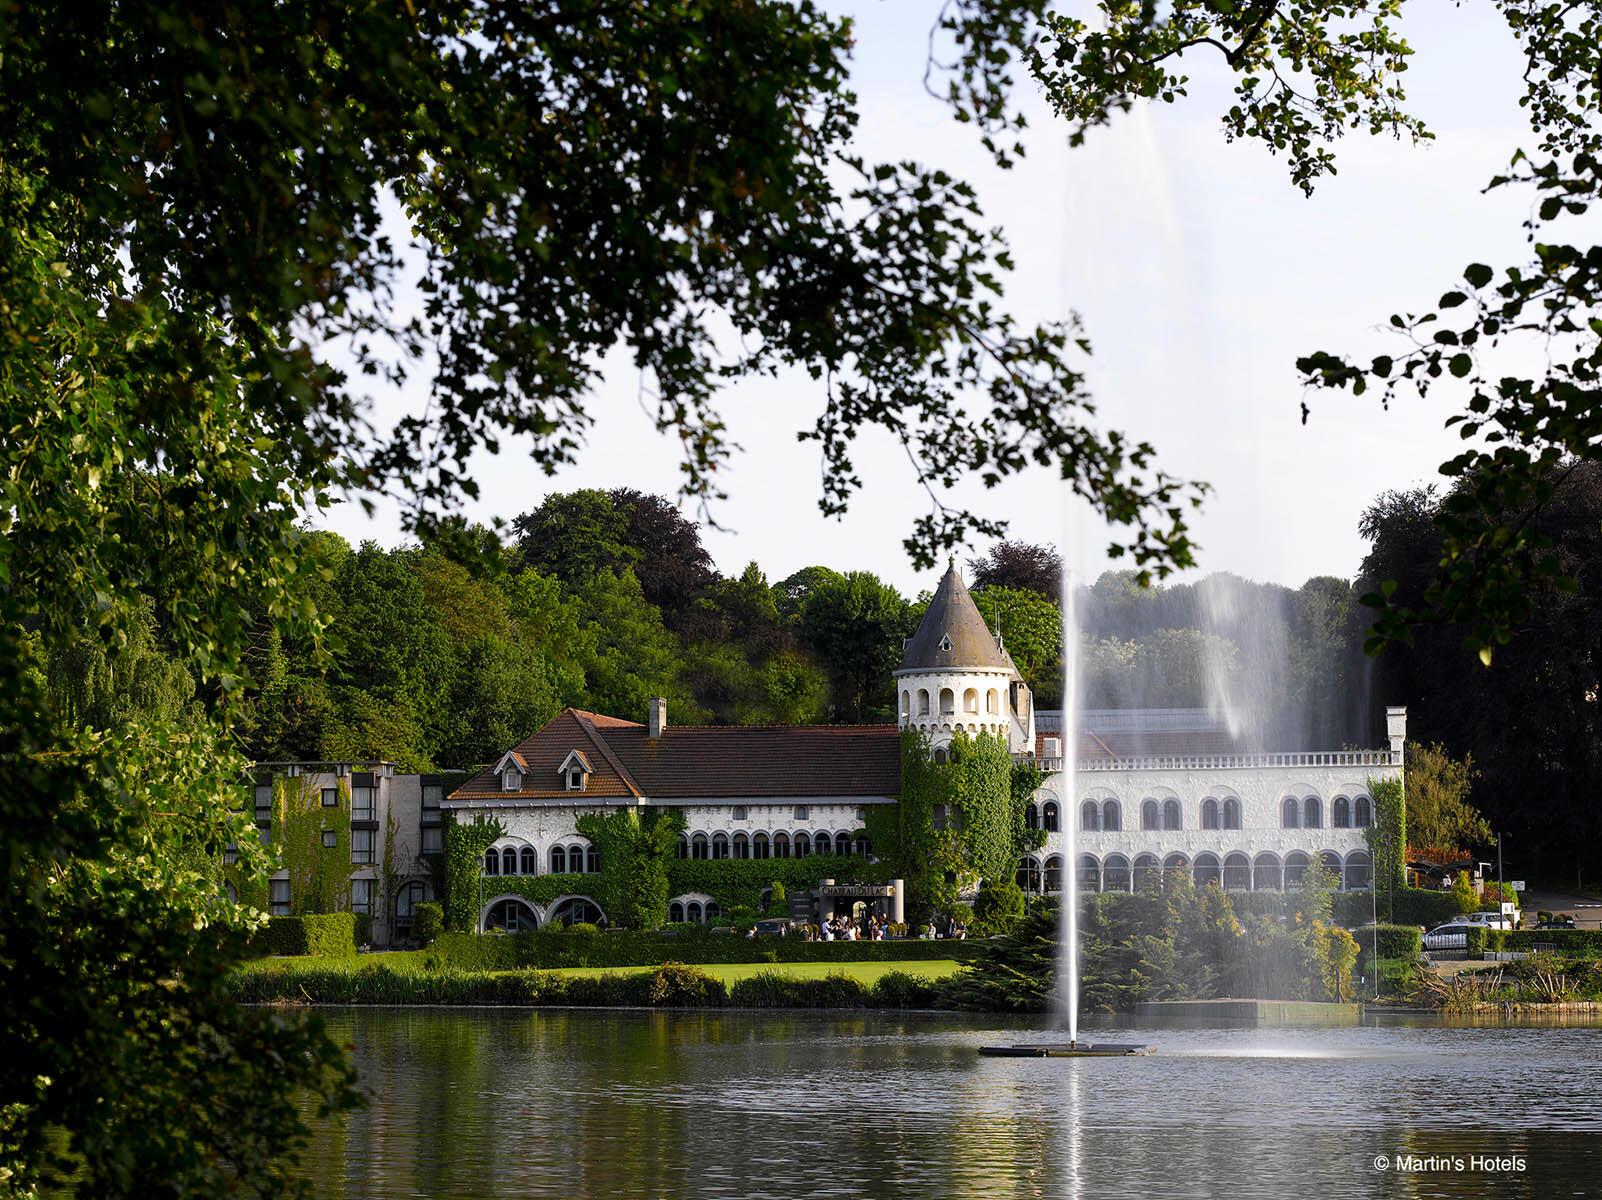 Château du Lac setting Relax